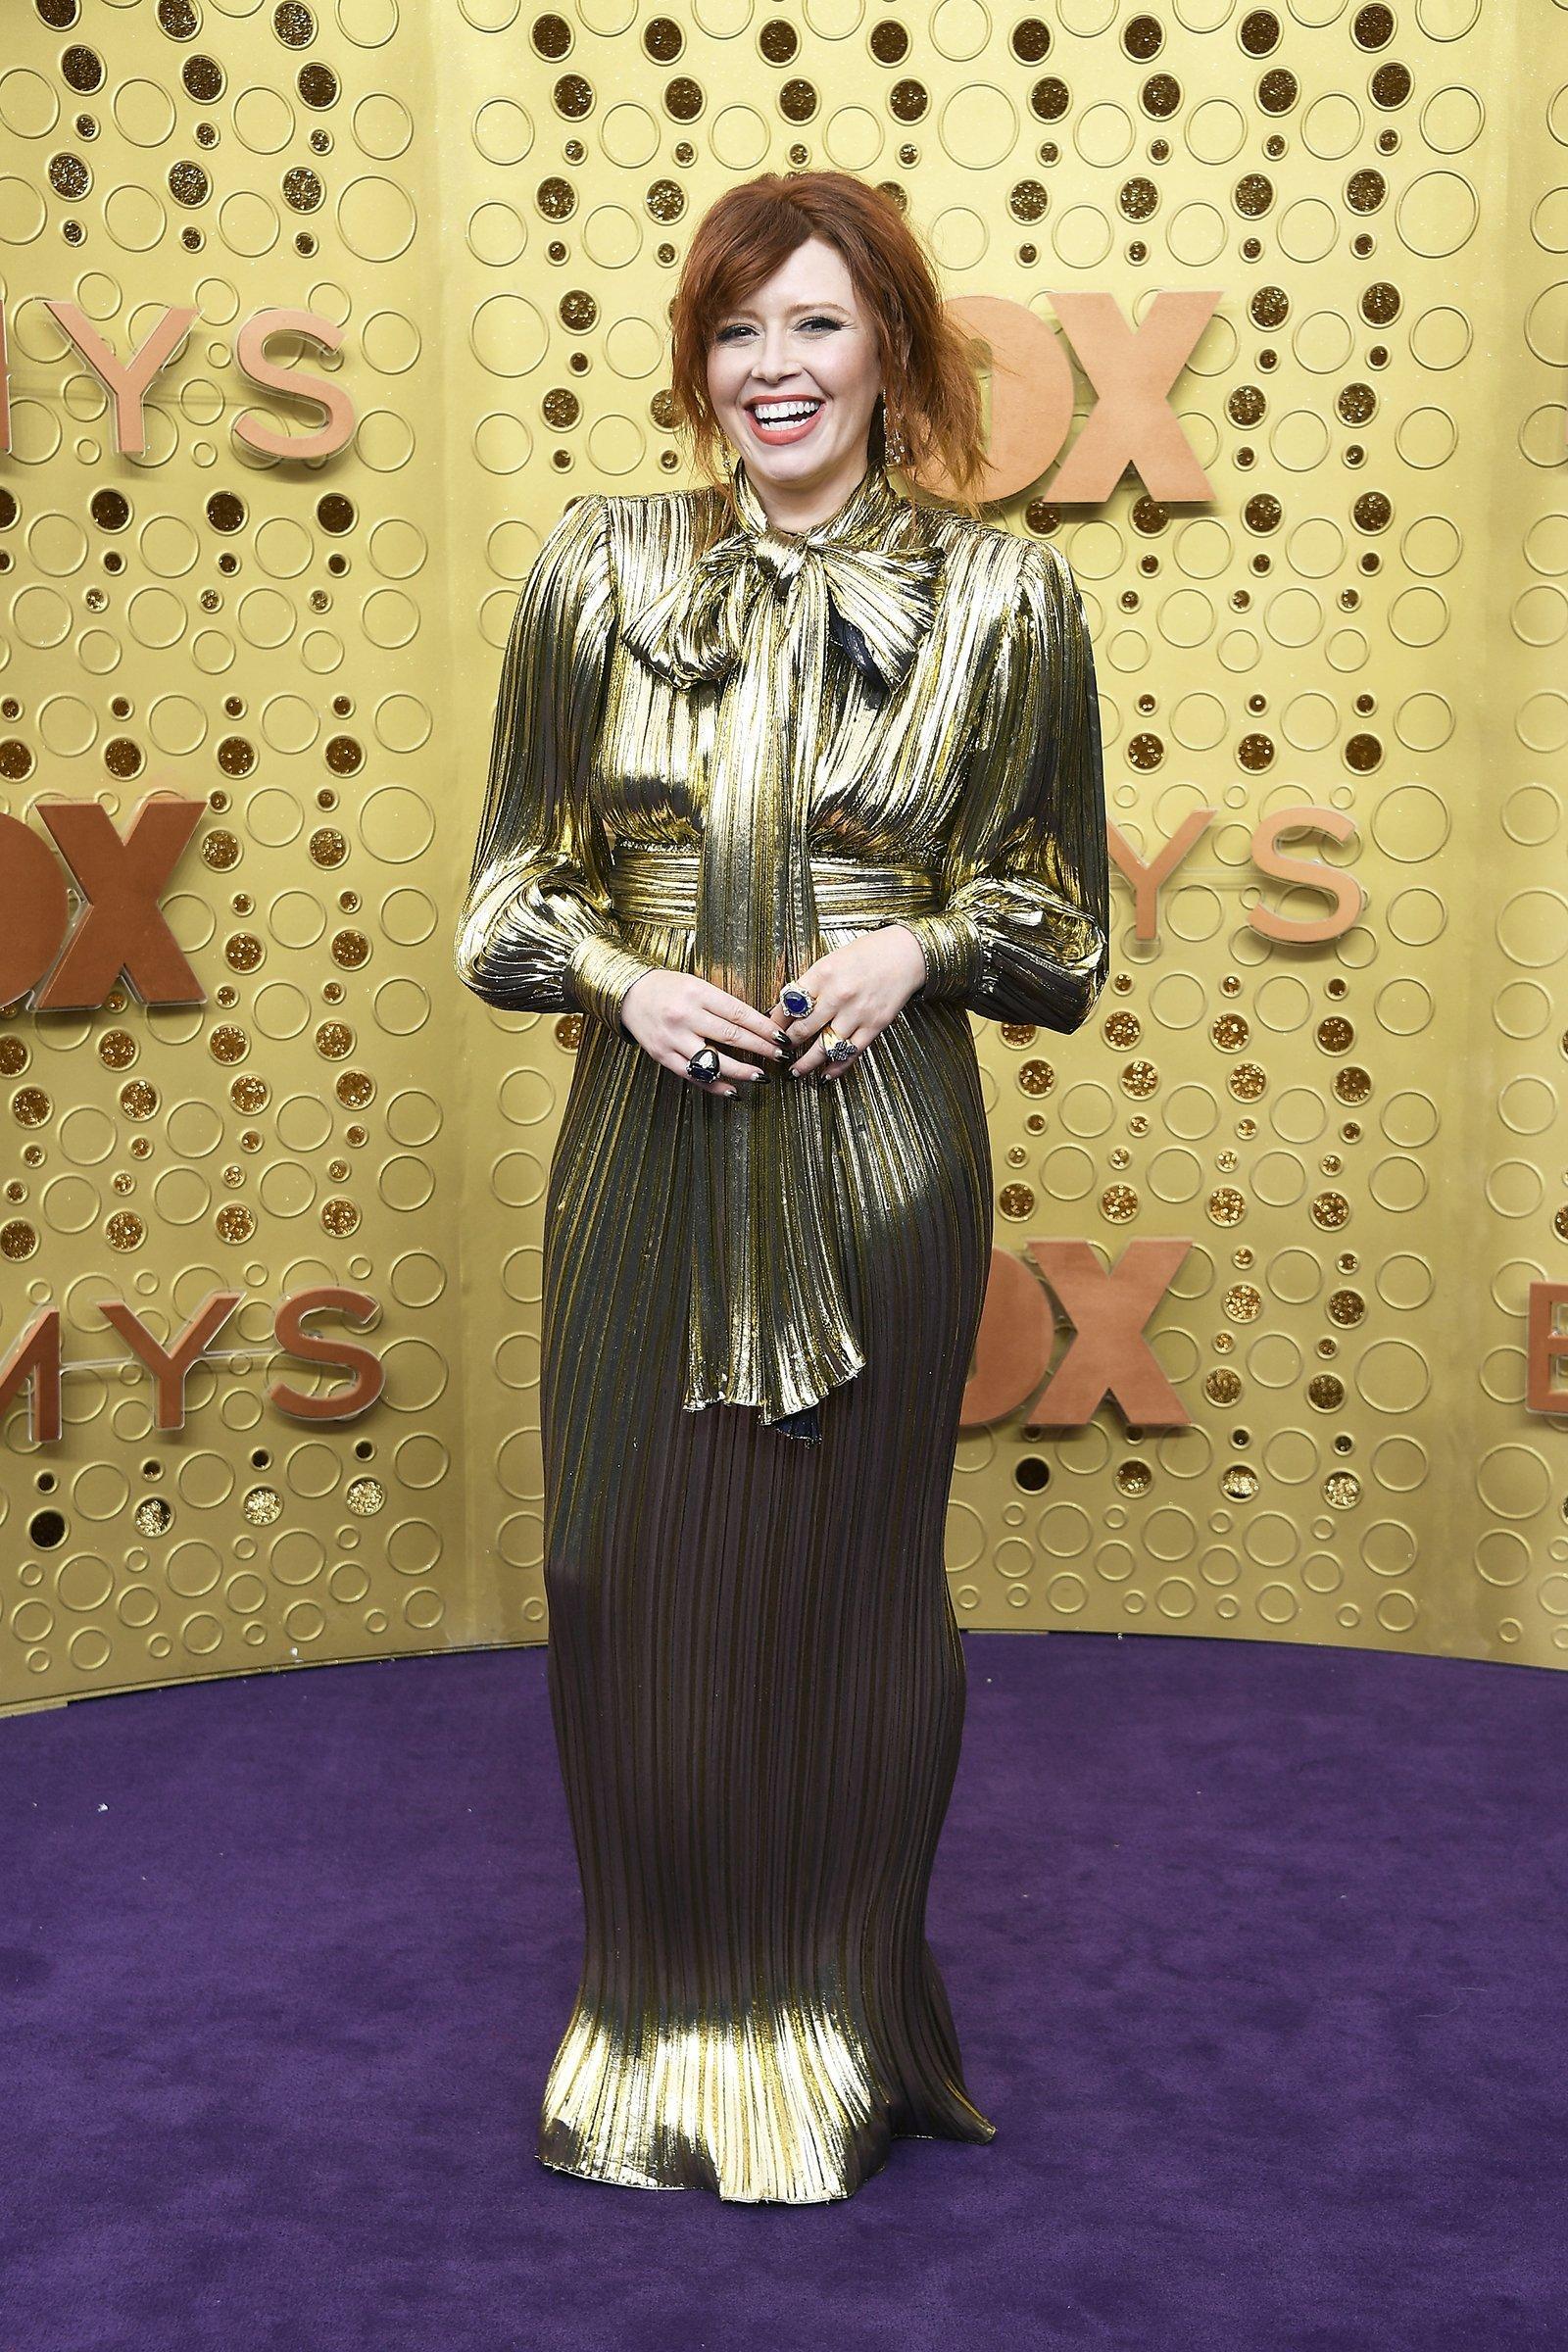 Natasha Lyonne's clap won Twitter on Emmys night